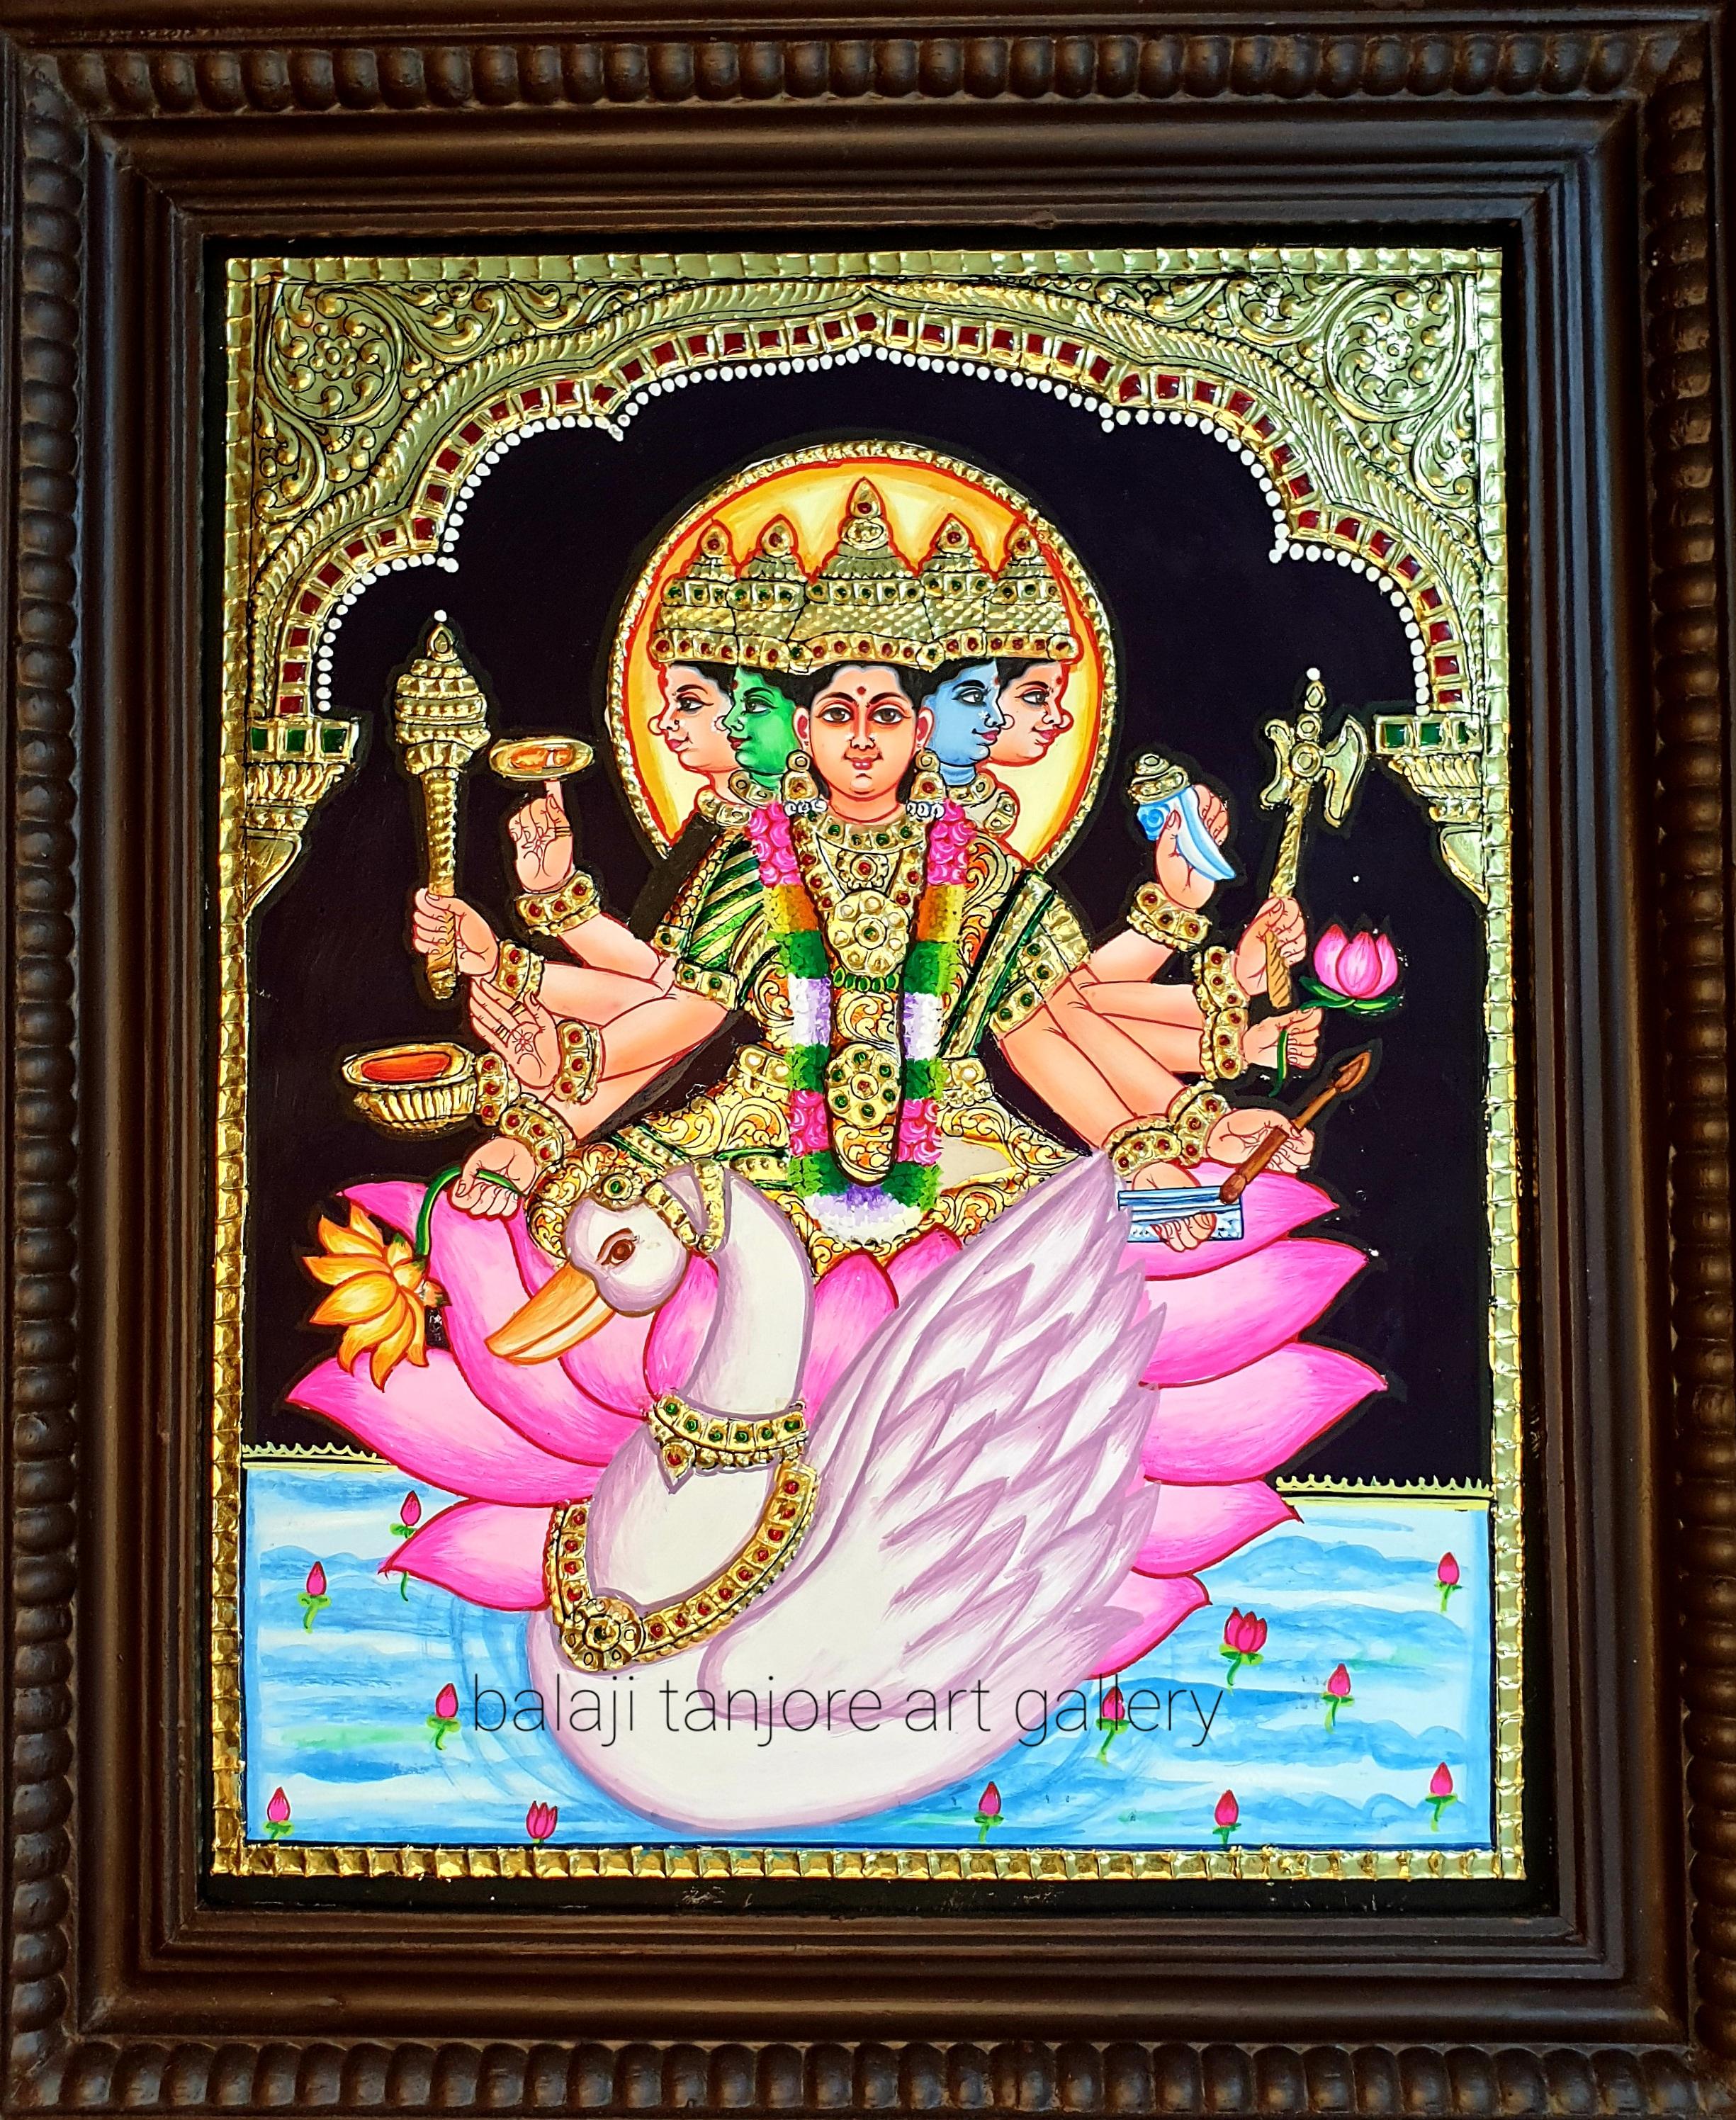 gayathri tanjore painting